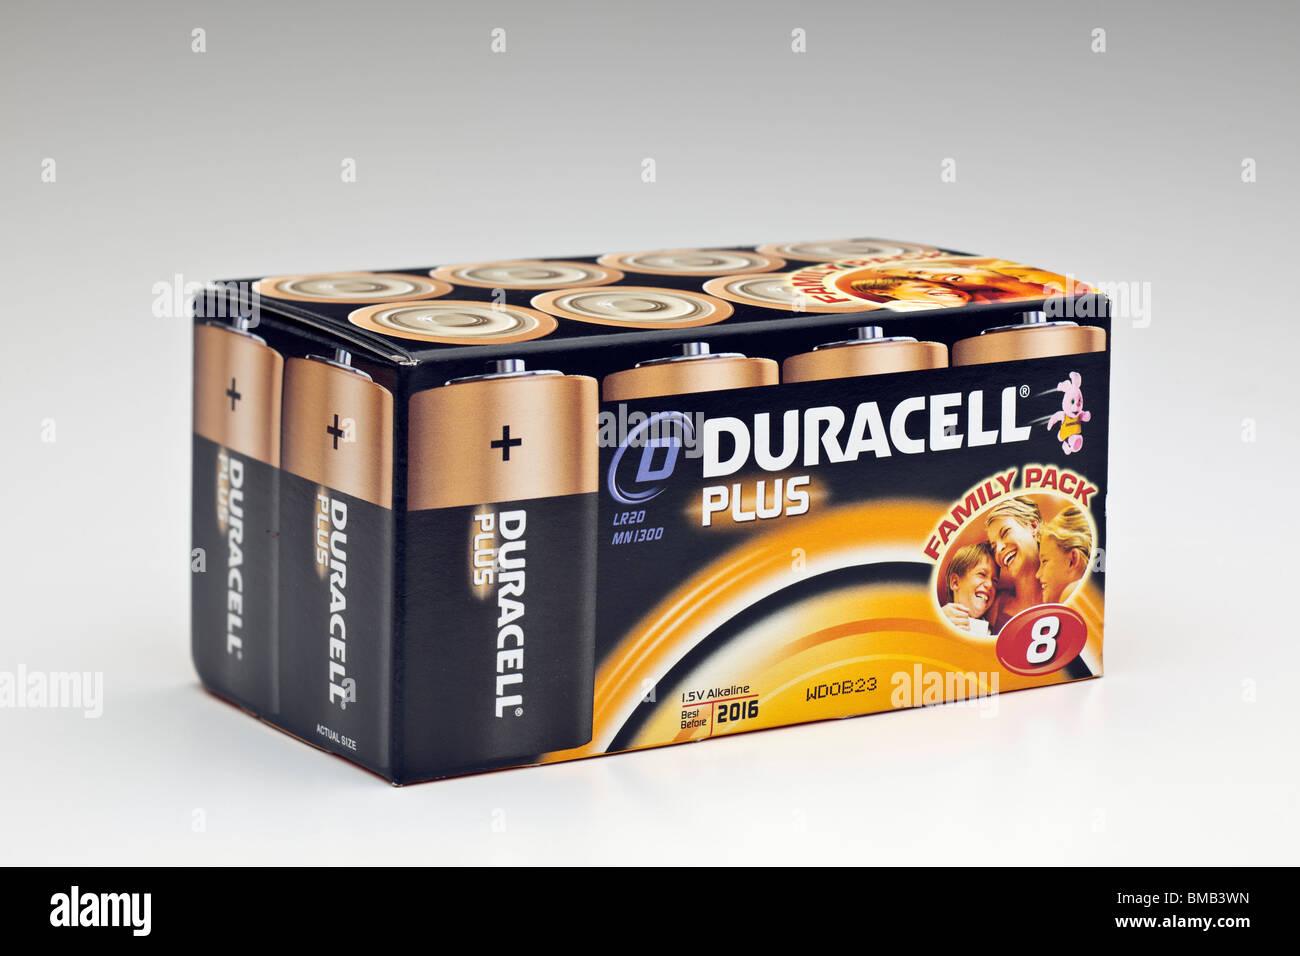 Box of eight Duracel Plus LR20 mn1300 1.5v alkaline batteries - Stock Image